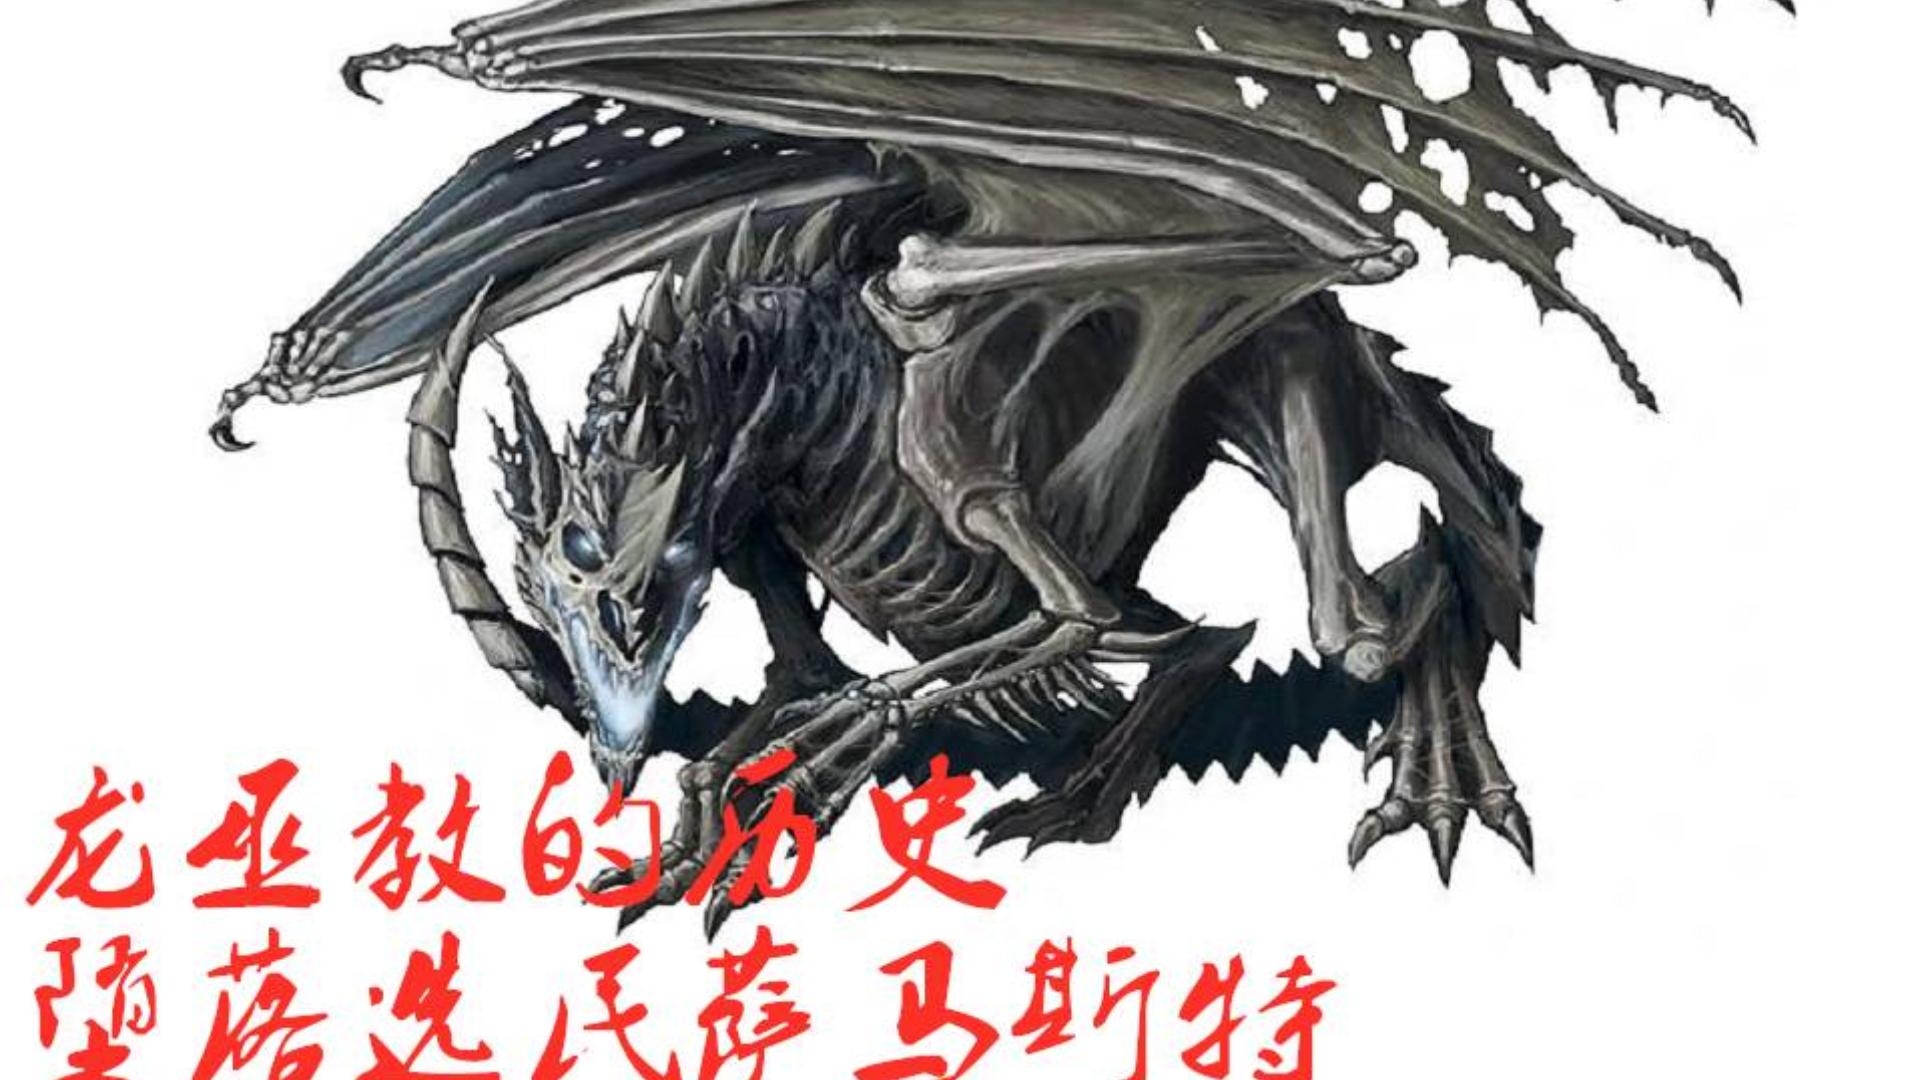 DND龙与地下城 奇幻人物志 萨马斯特 龙巫妖教拜龙教创立者 堕落的魔法女神选民 洛山达之血的来历